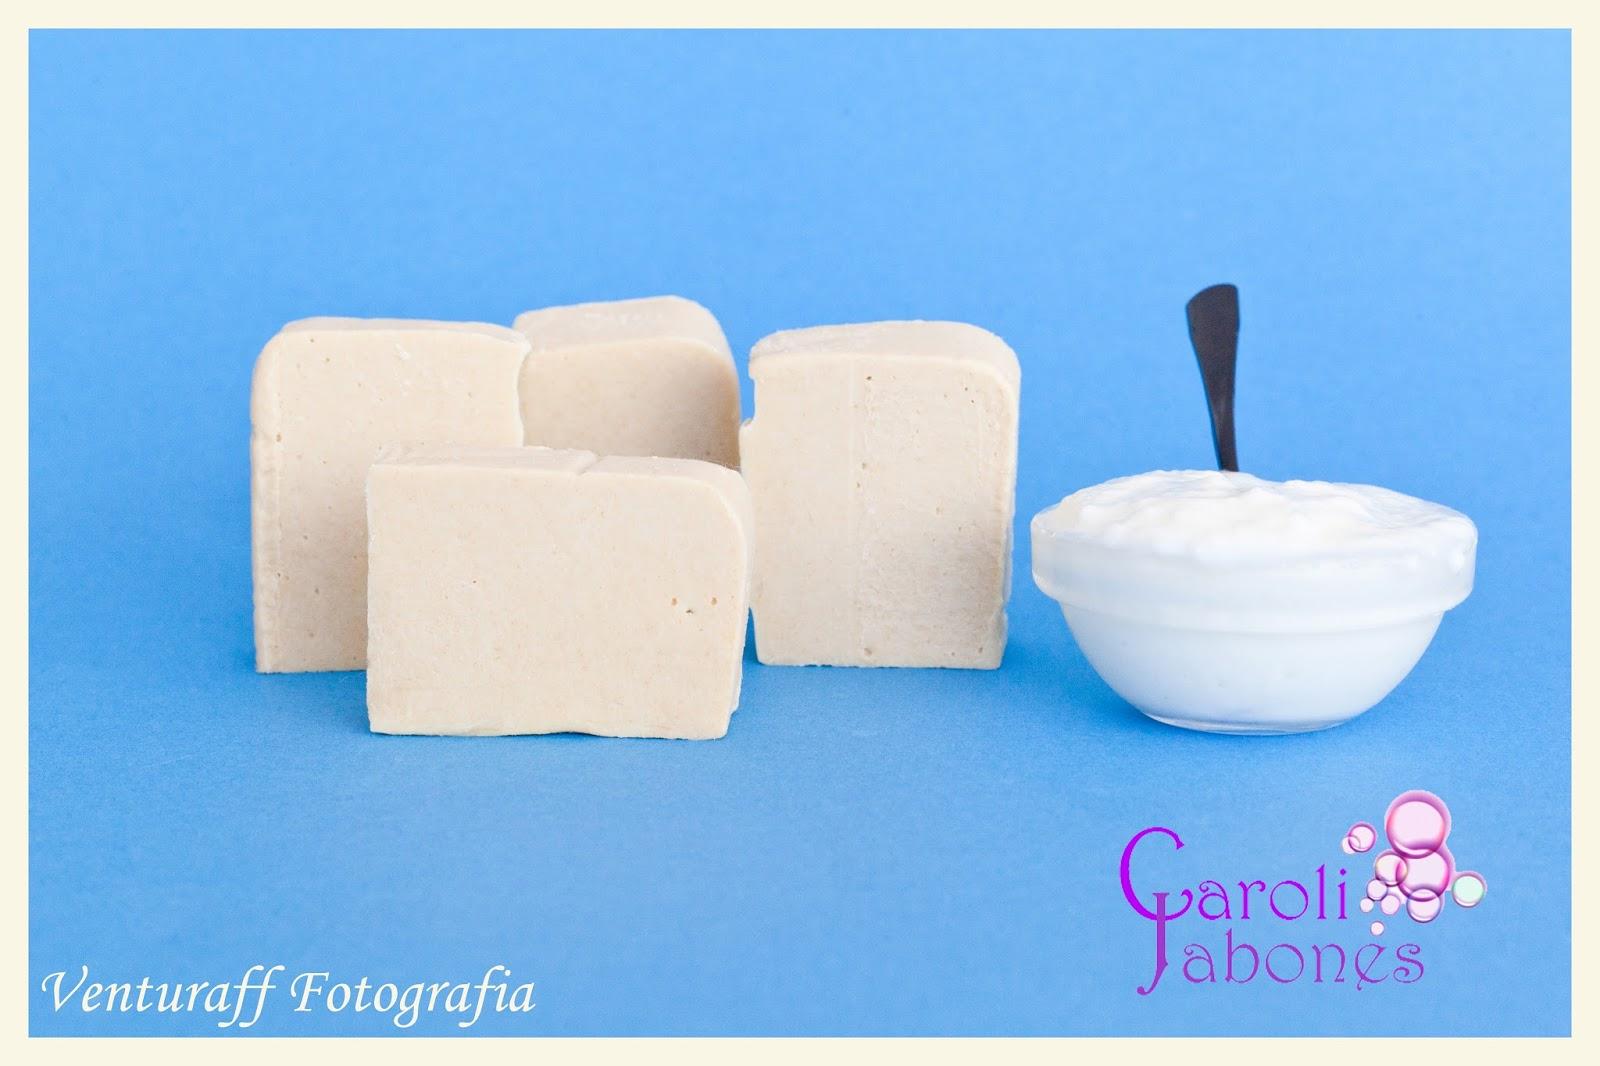 Caroli jabones cat logo de jabones for Piscina hongos genitales